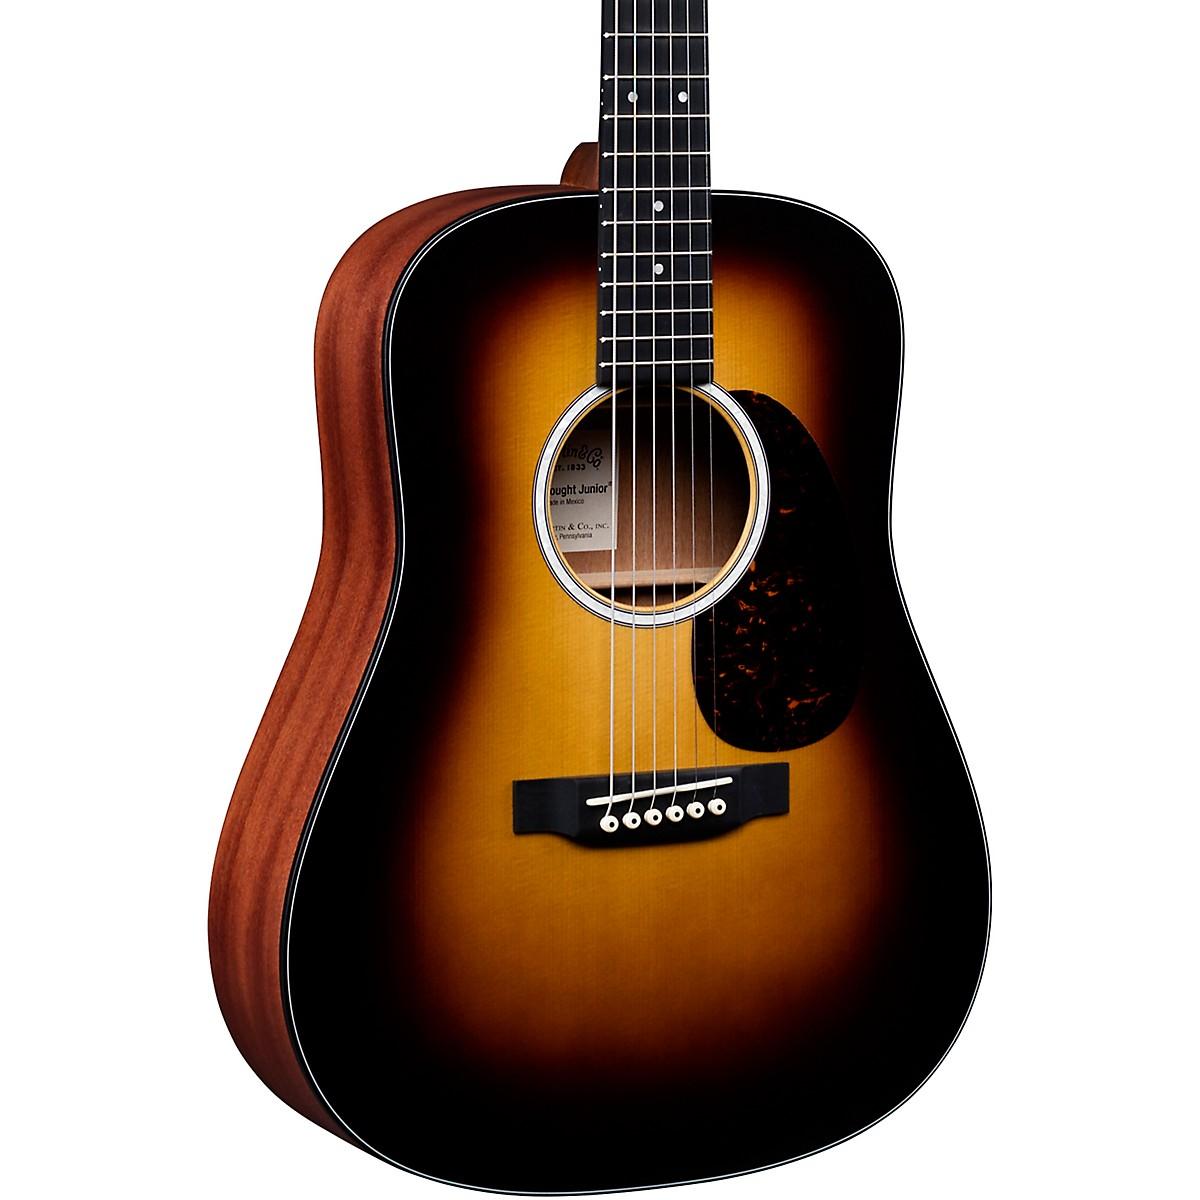 Martin DJr-10E Burst Dreadnought Junior Acoustic-Electric Guitar